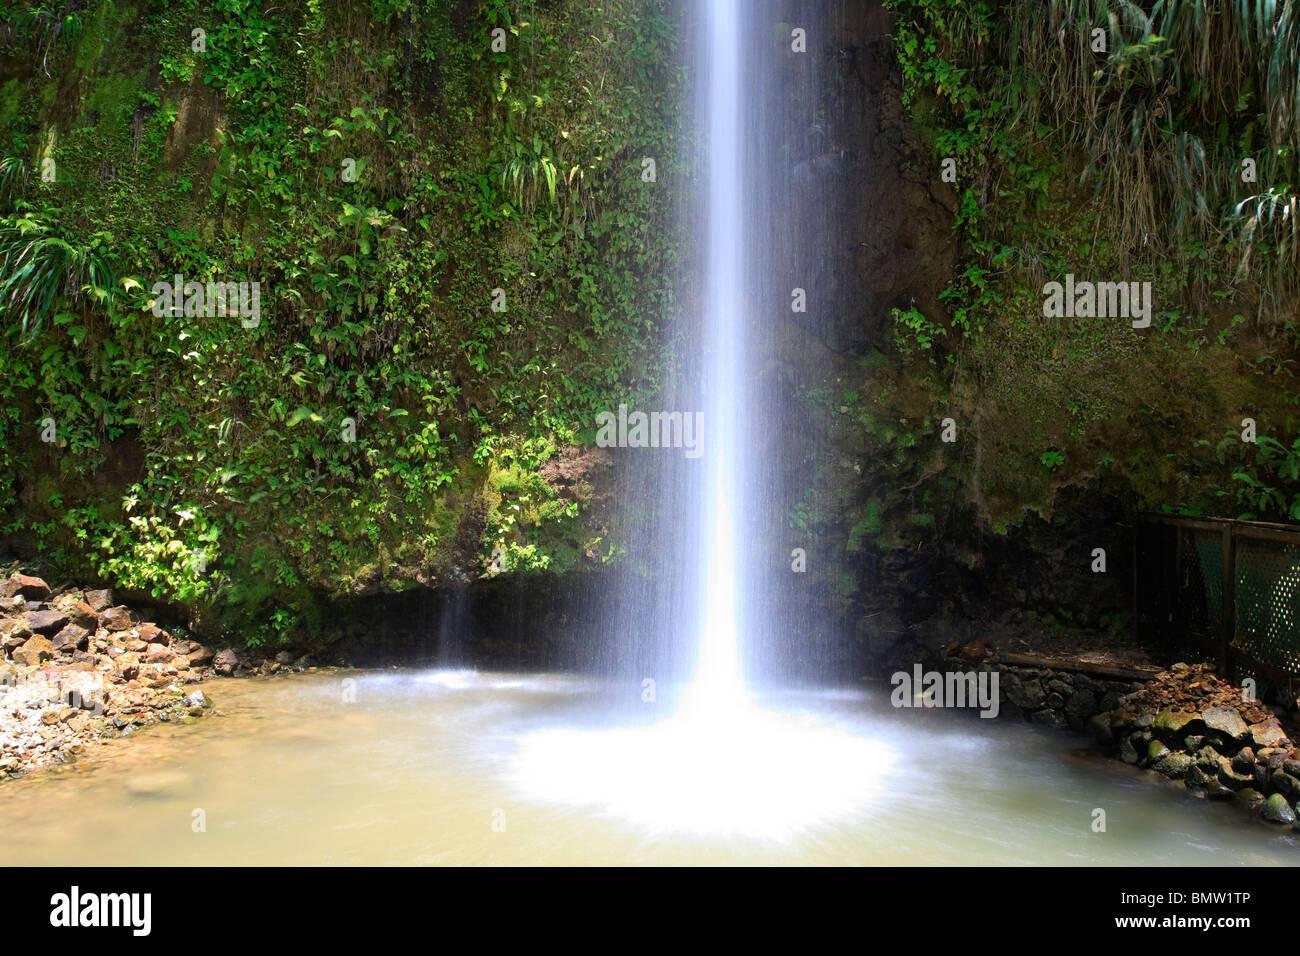 Karibik, St. Lucia, Toraille Wasserfall Stockbild